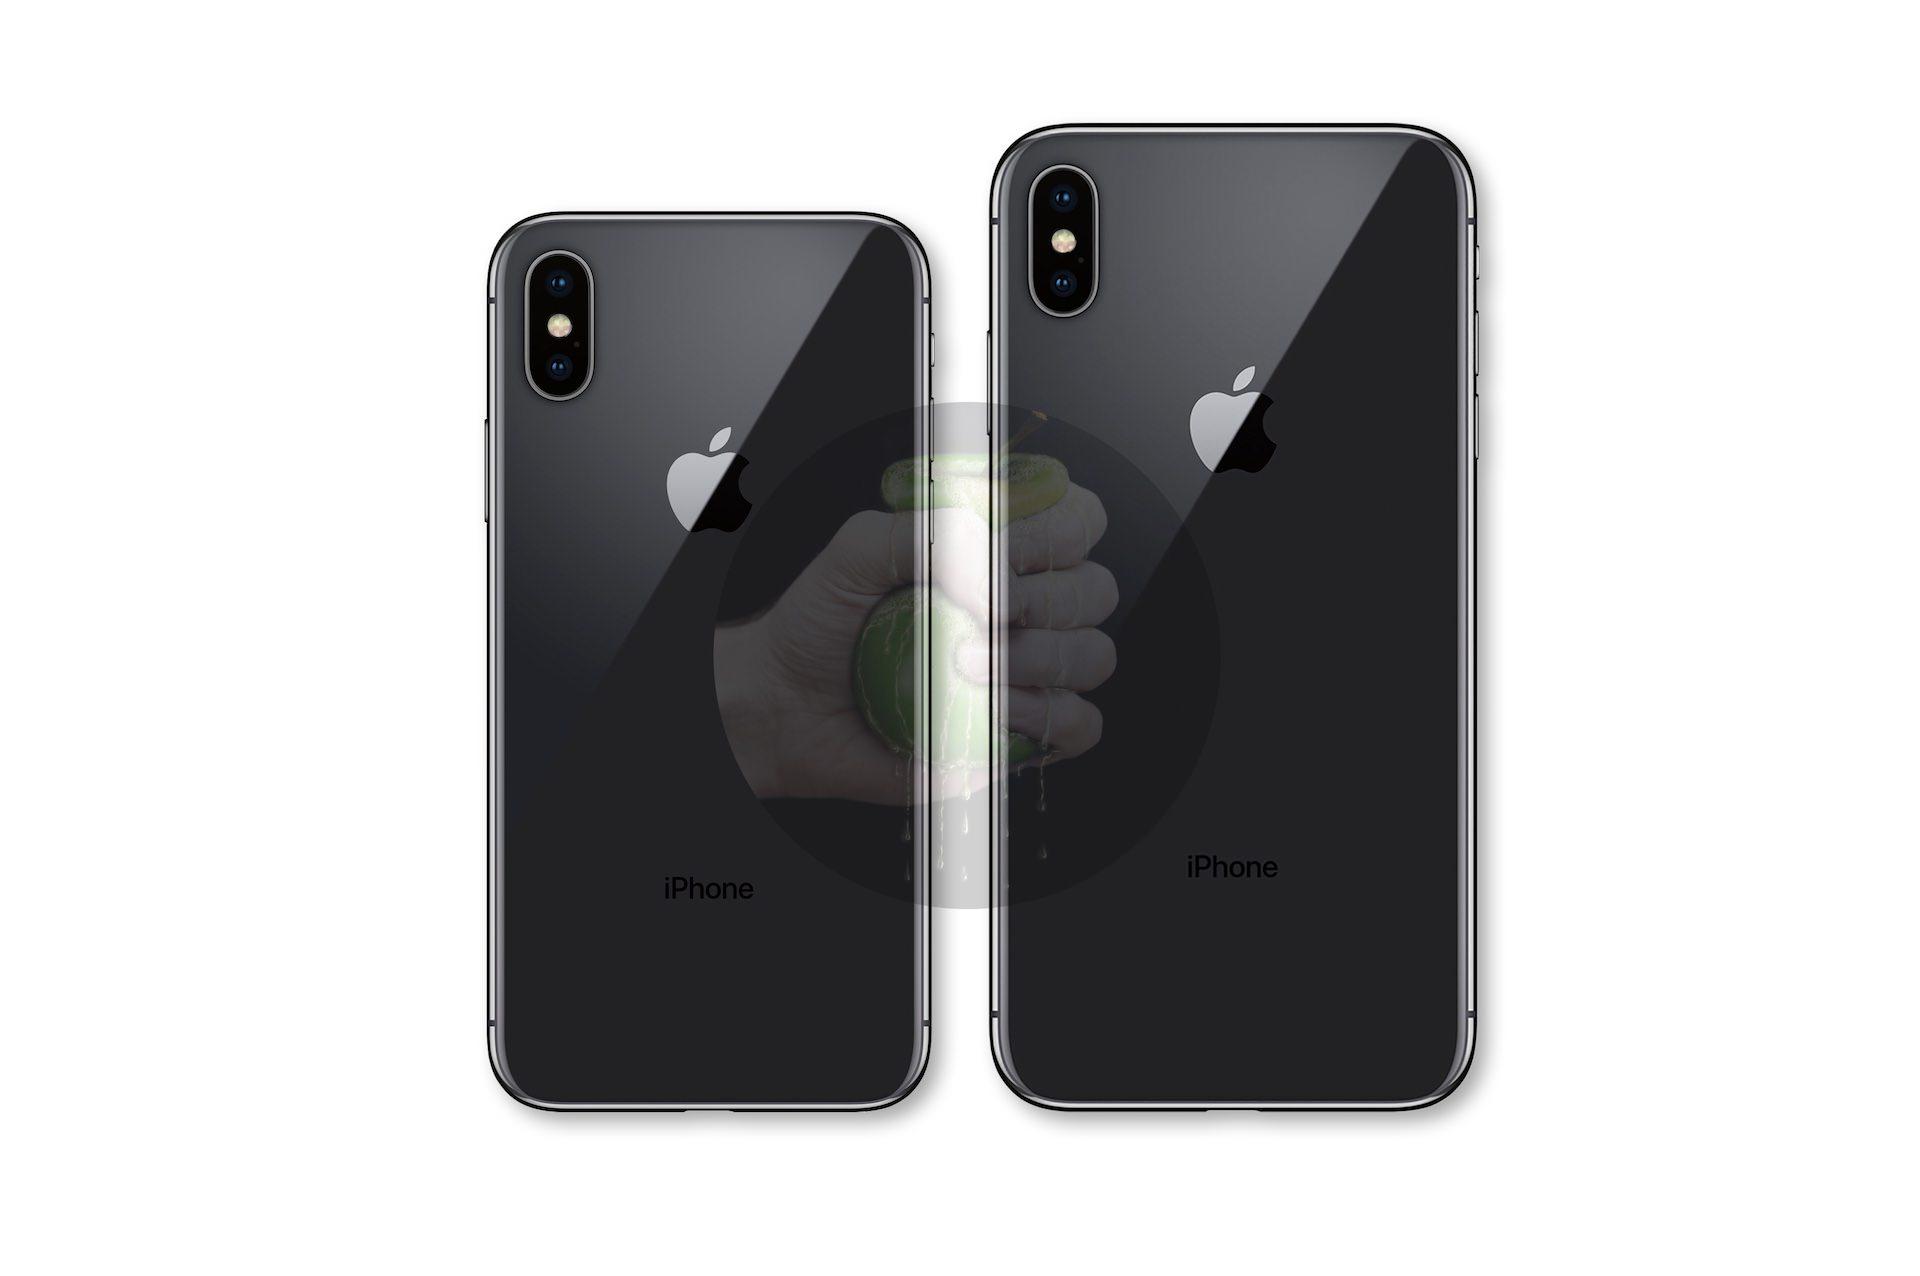 iPhone-9-wylsacom-4.jpg